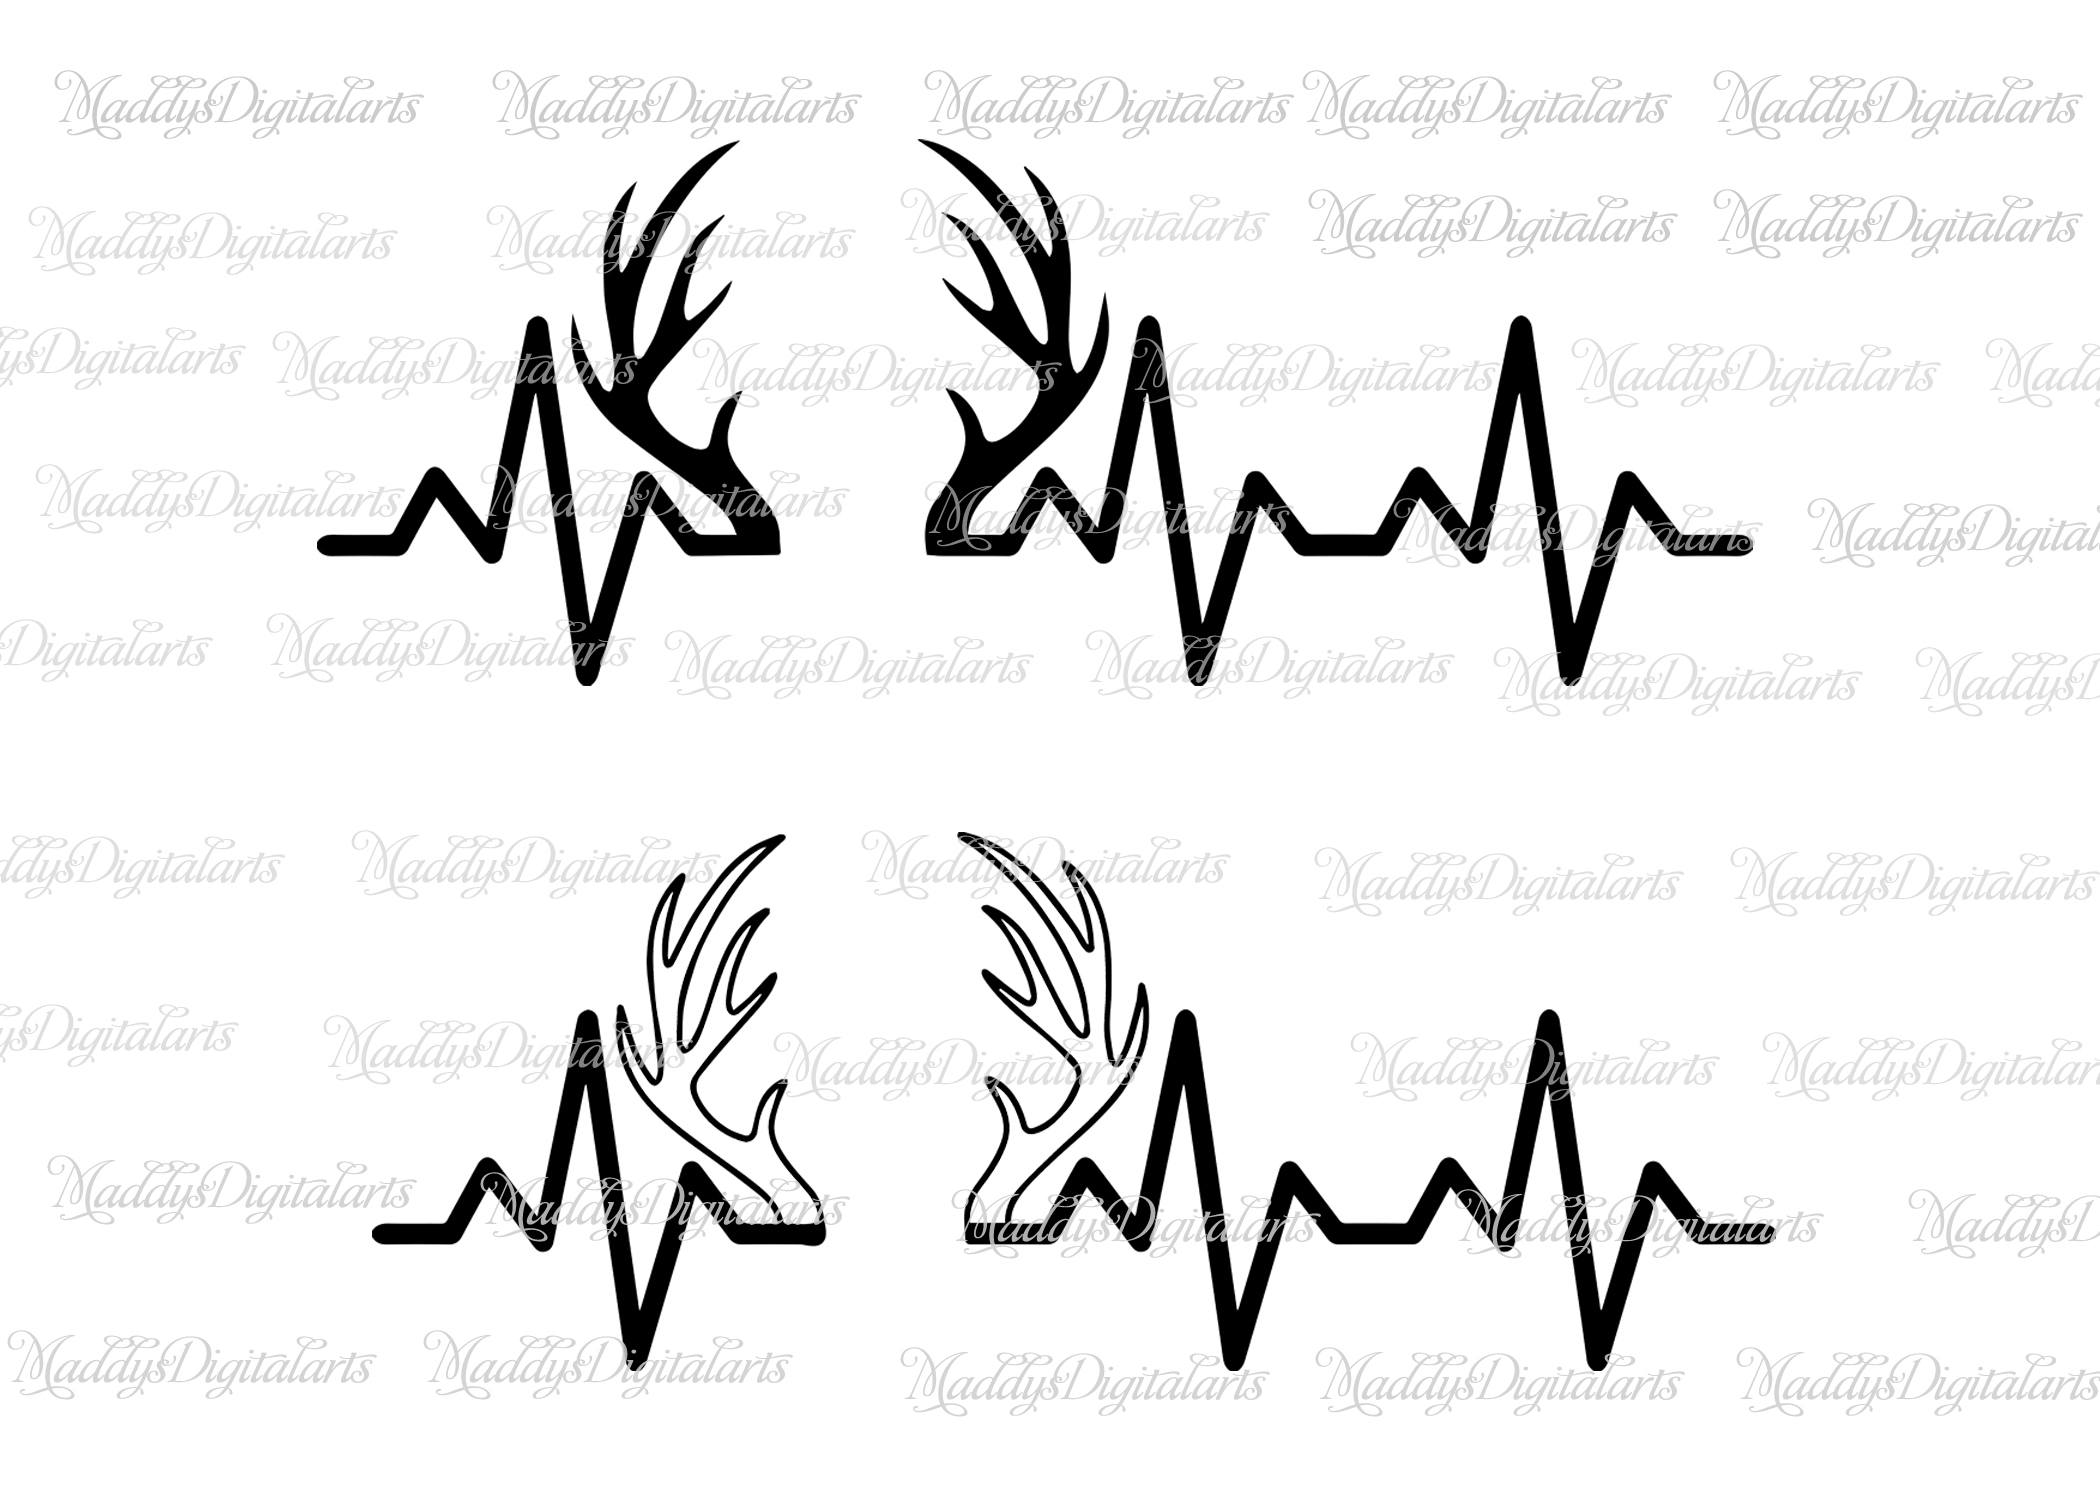 2100x1500 Heartbeat Horns Deer Svg Cutting File, Hunting Svg Heartbeat Buck